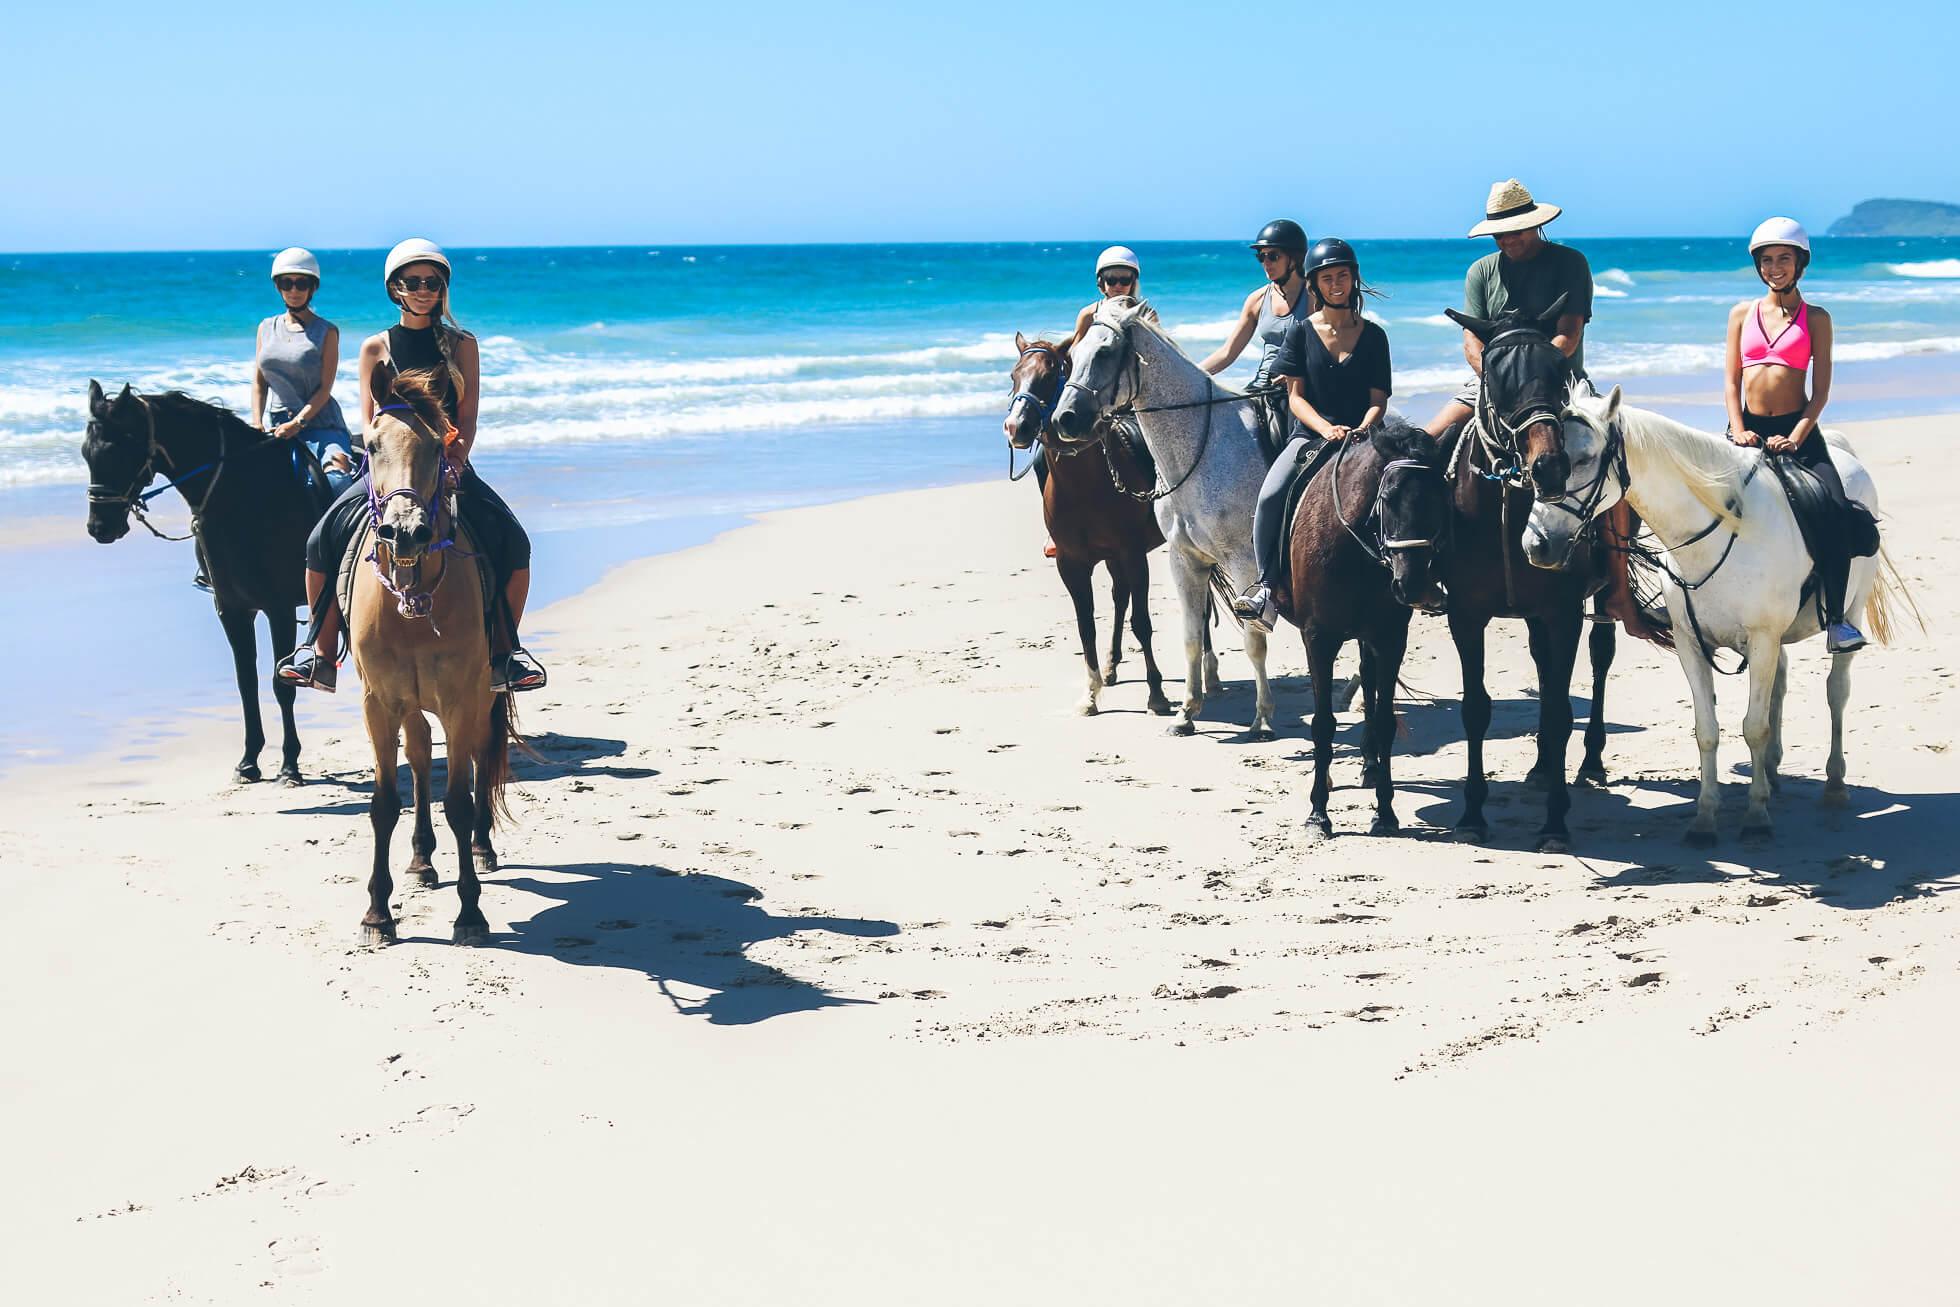 janni-deler-horseback-riding-byronbayIMG_1491